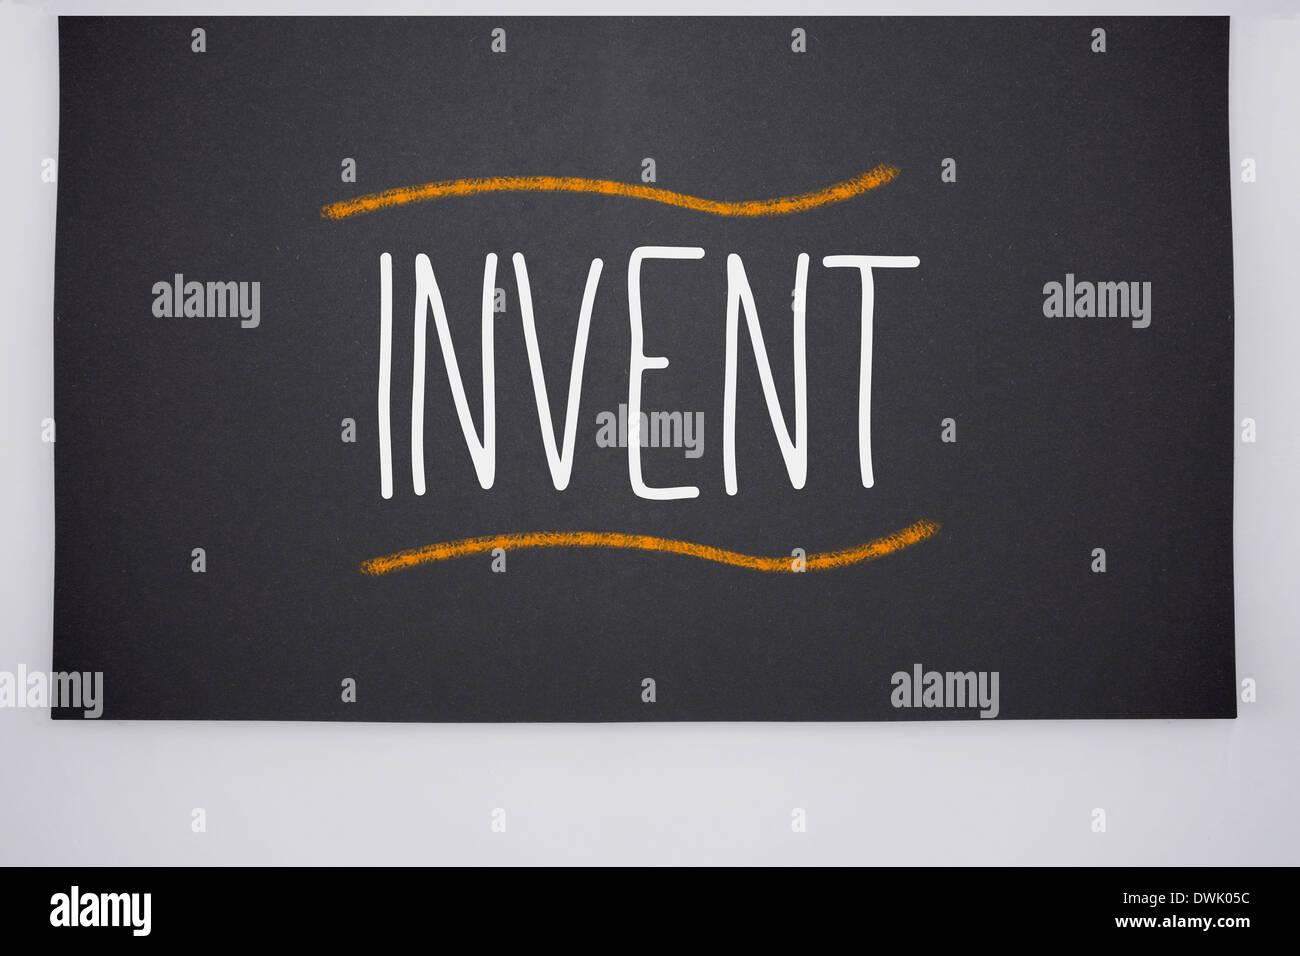 Invent written on big blackboard - Stock Image